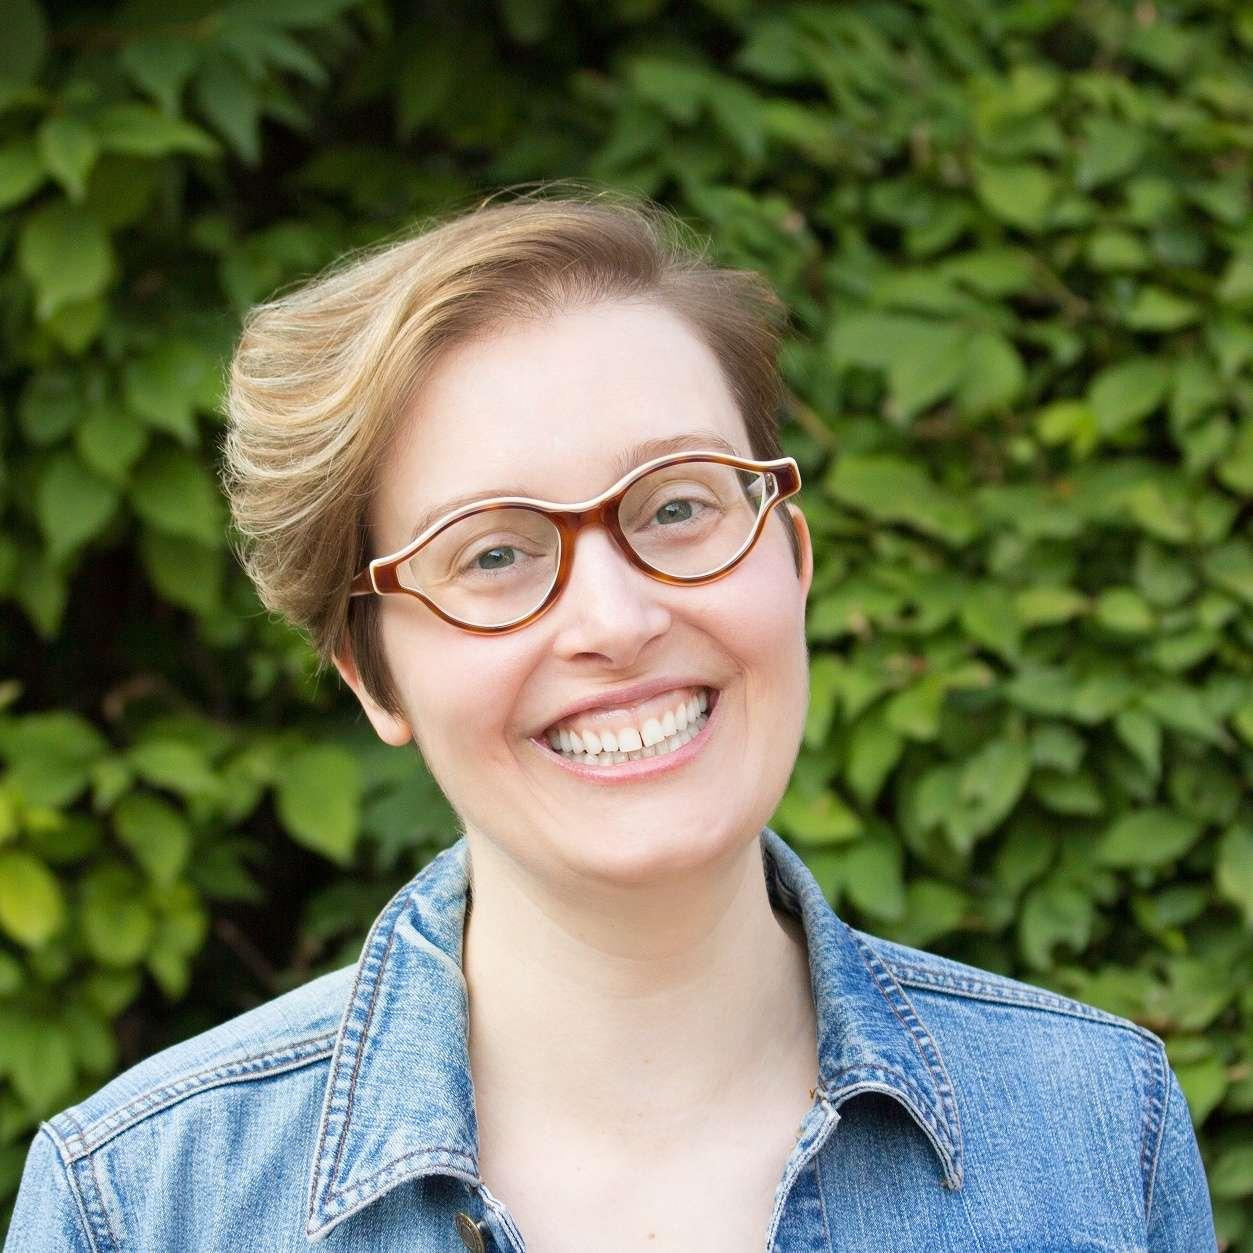 Jennifer-Polk-From-PhD-to-Life